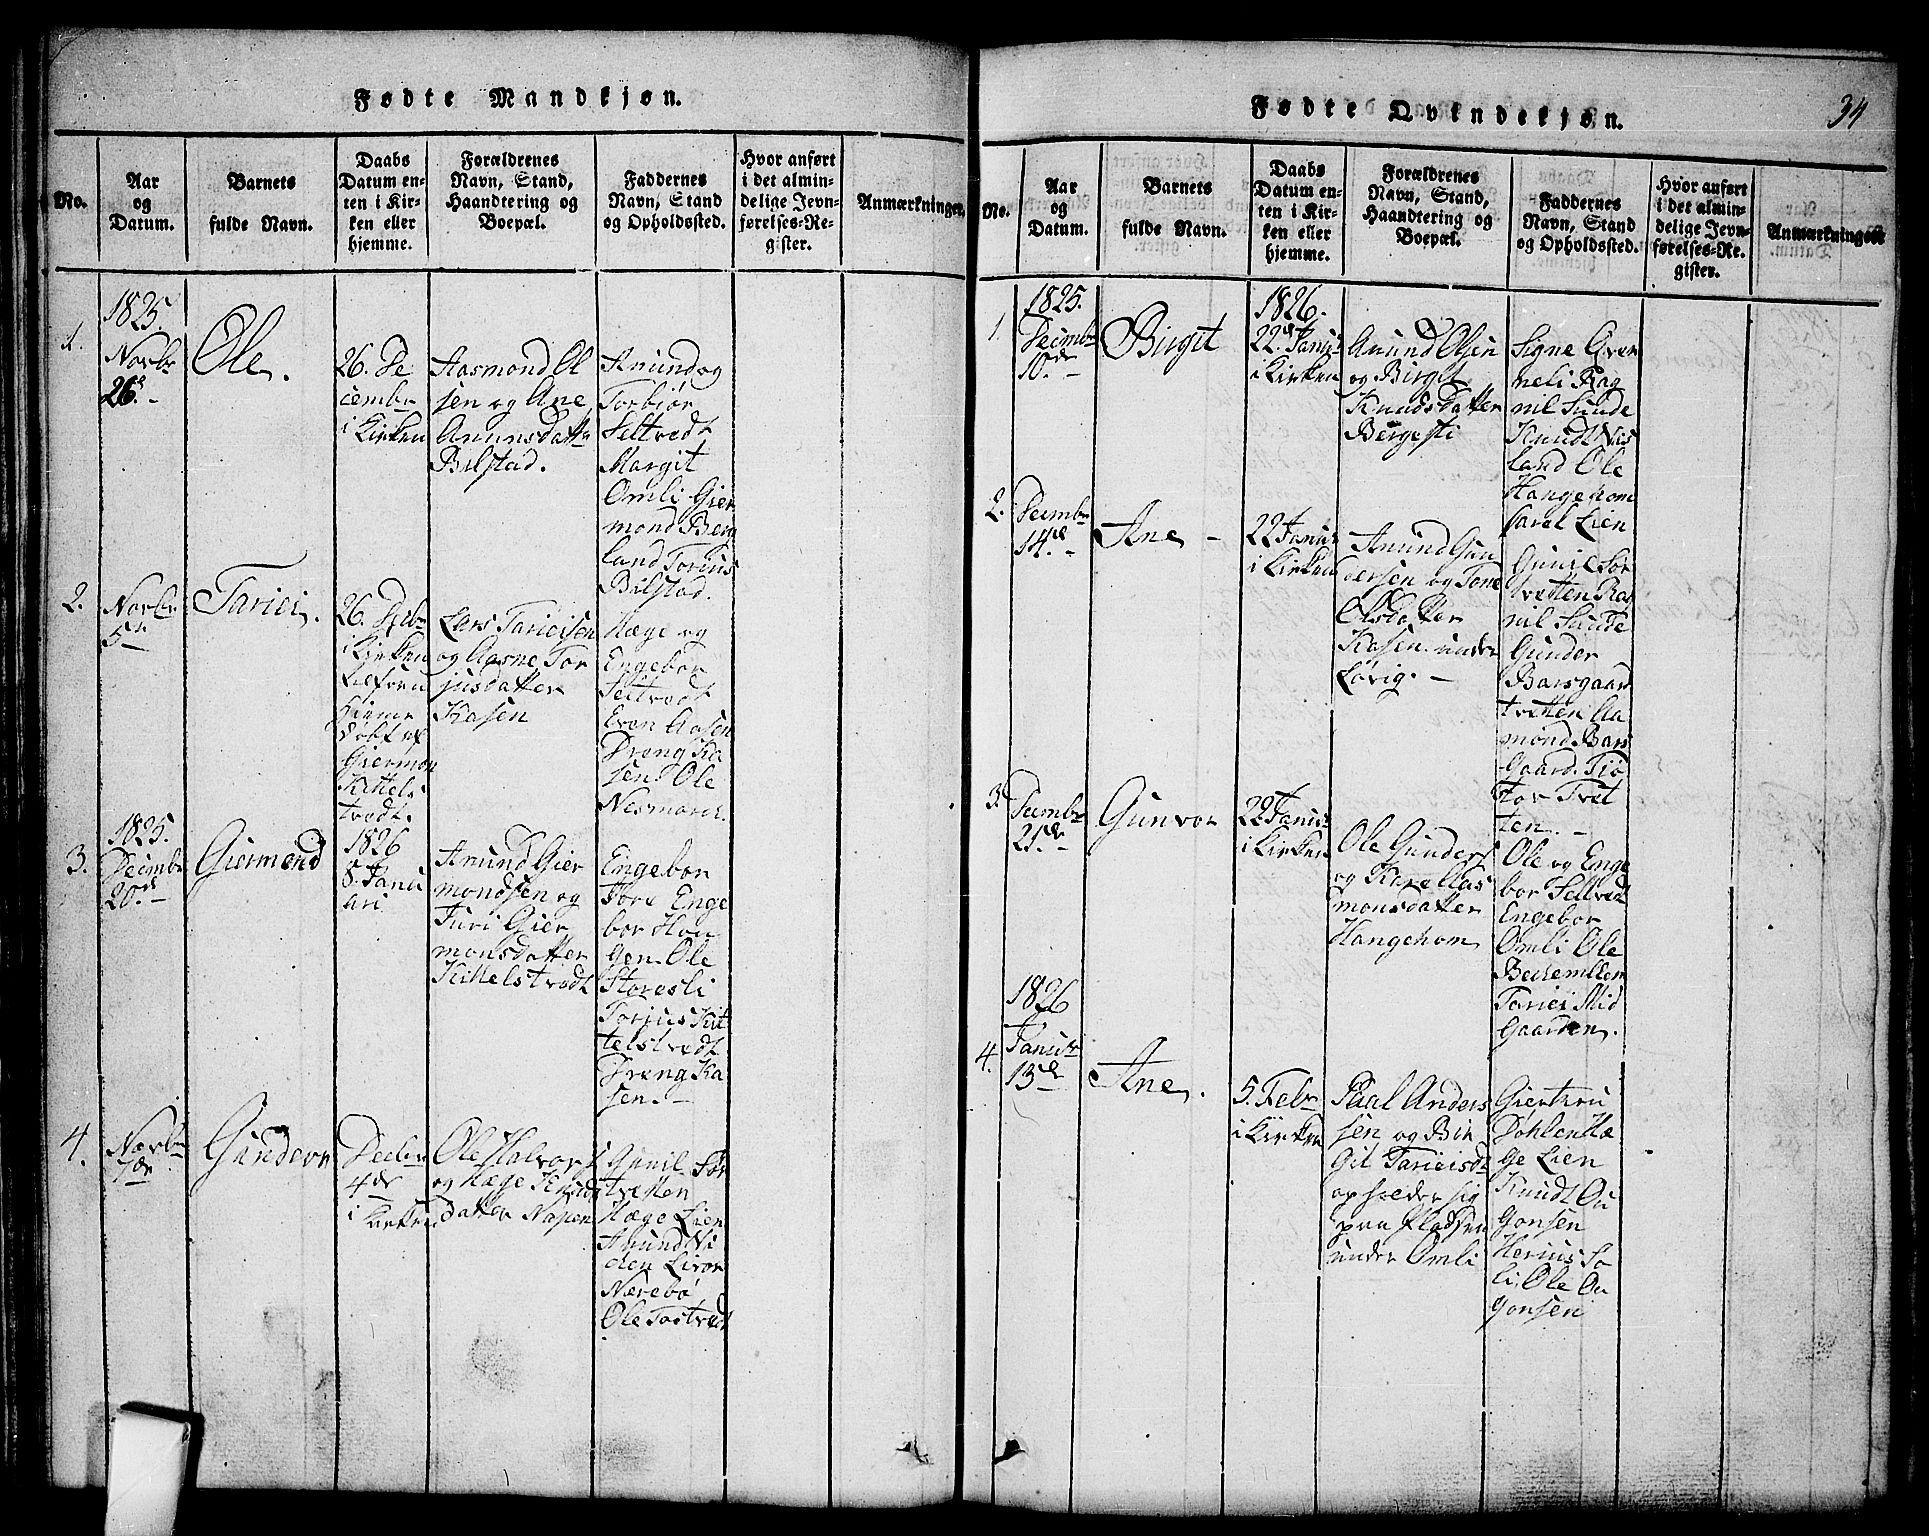 SAKO, Mo kirkebøker, G/Gb/L0001: Klokkerbok nr. II 1, 1814-1843, s. 34